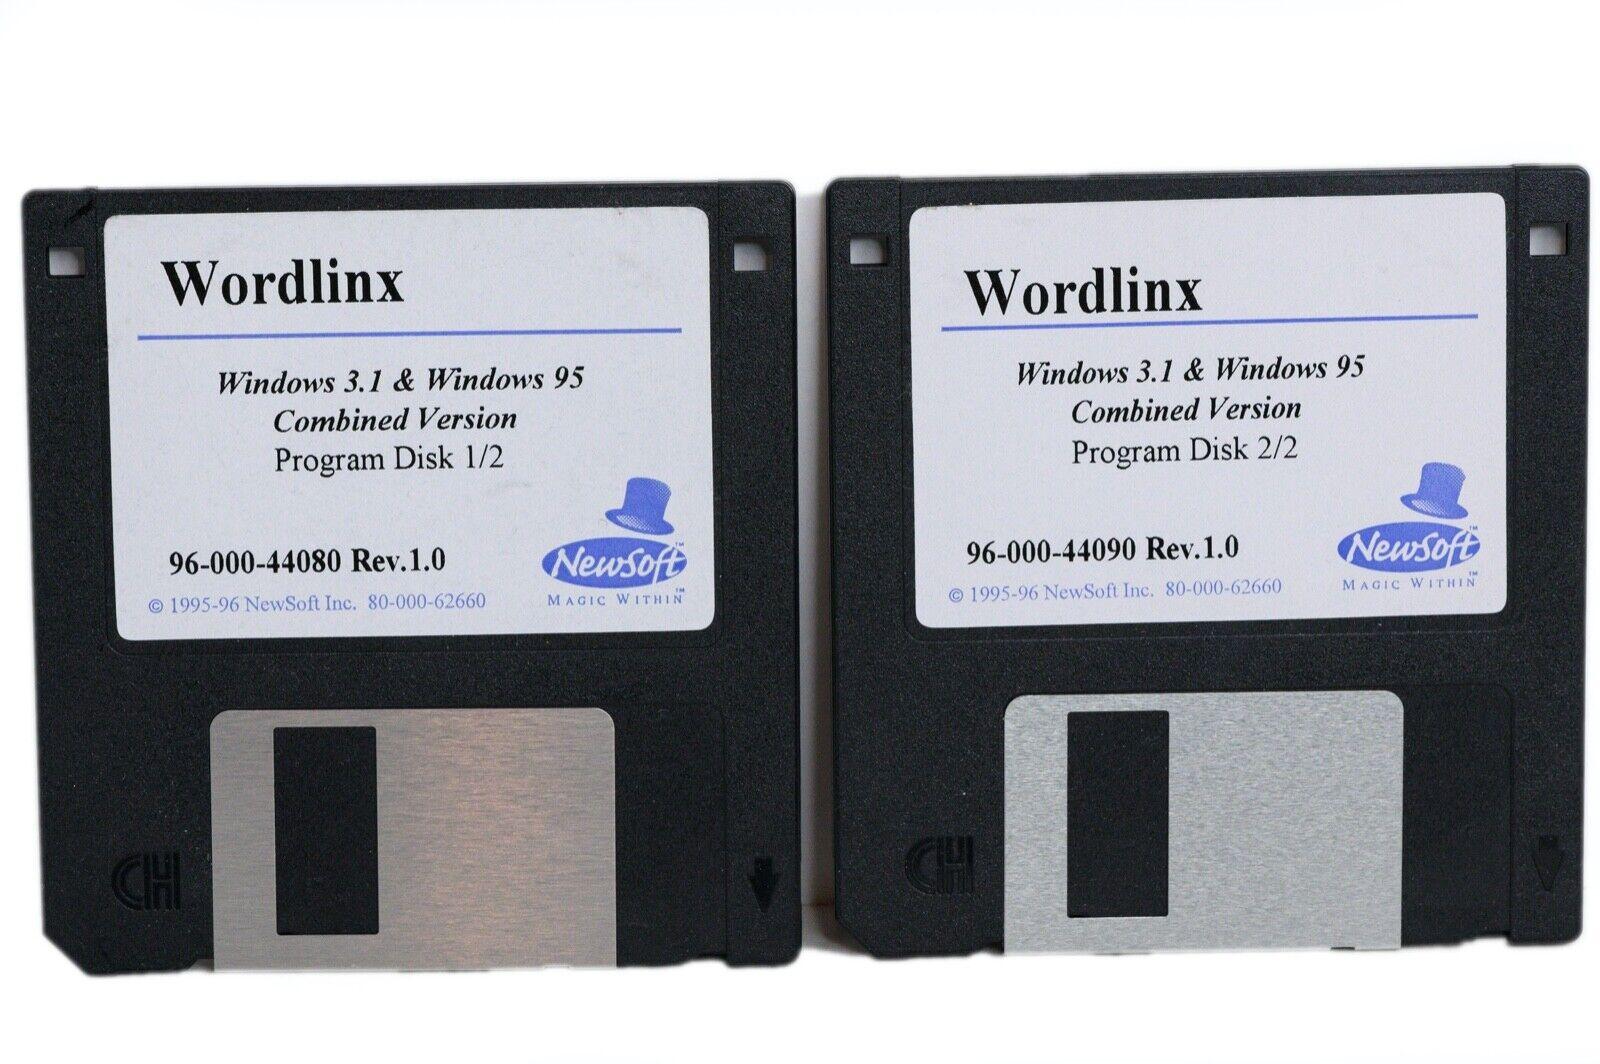 Newsoft Wordlinx OCR Software for Windows 3.1 and Windows 95 Item 96 000 44080